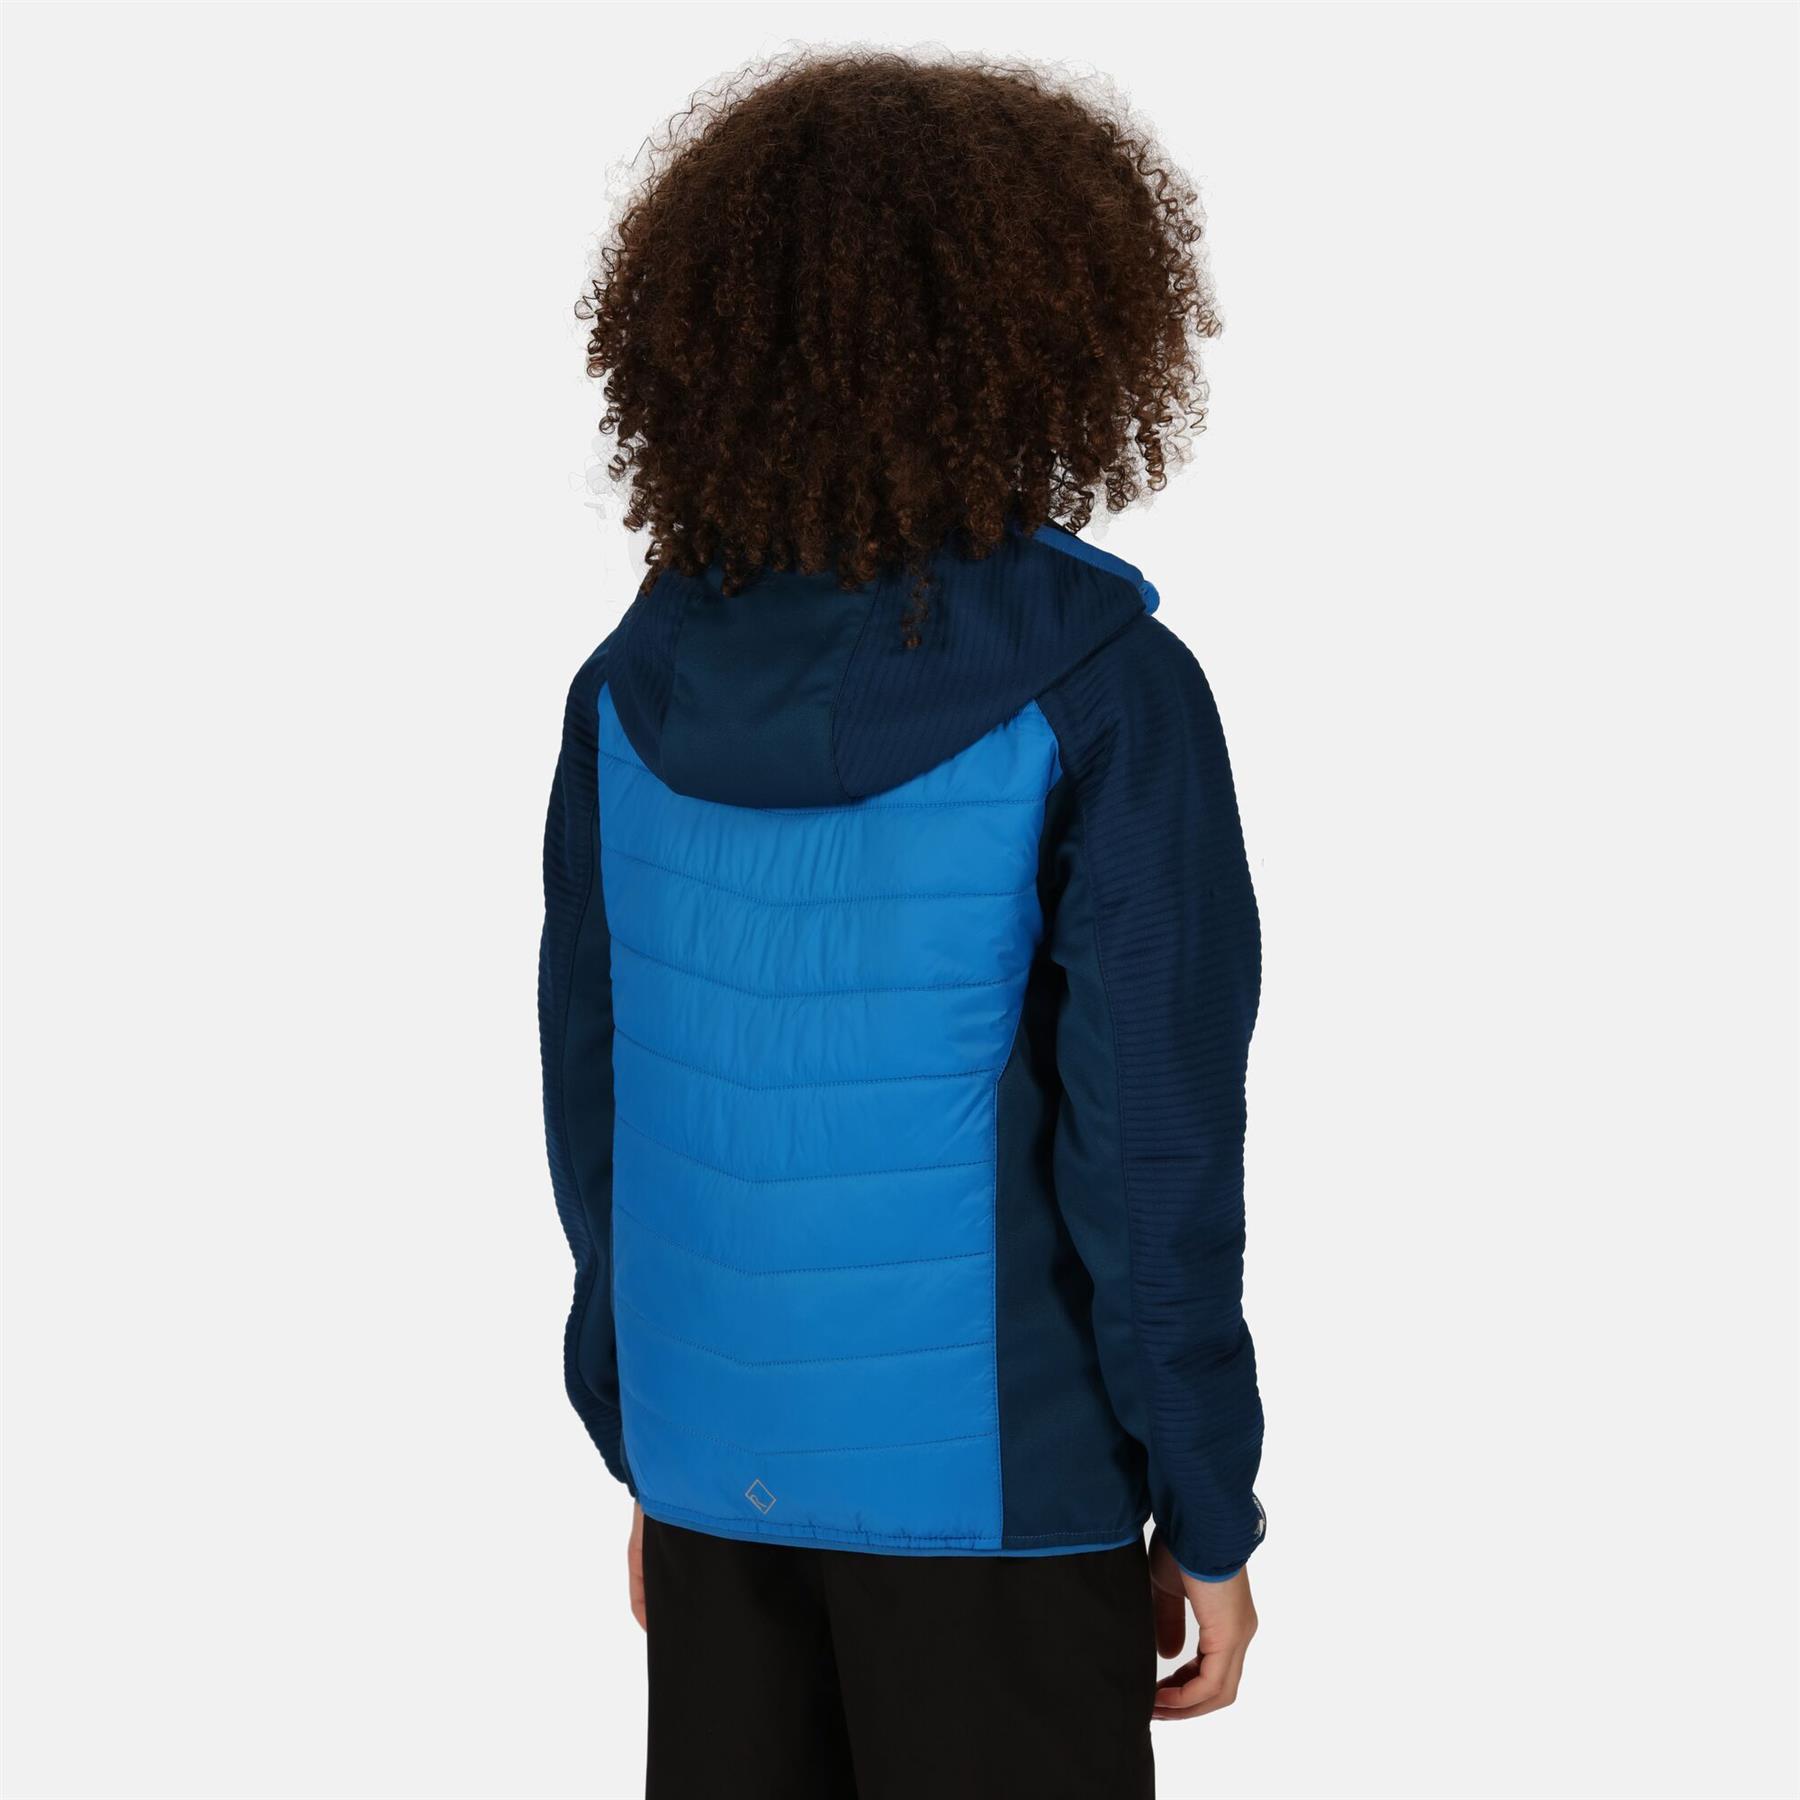 miniatuur 4 - Regatta Kids Kielder IV Lightweight Hybrid Softshell Jacket Boys Girls Coat